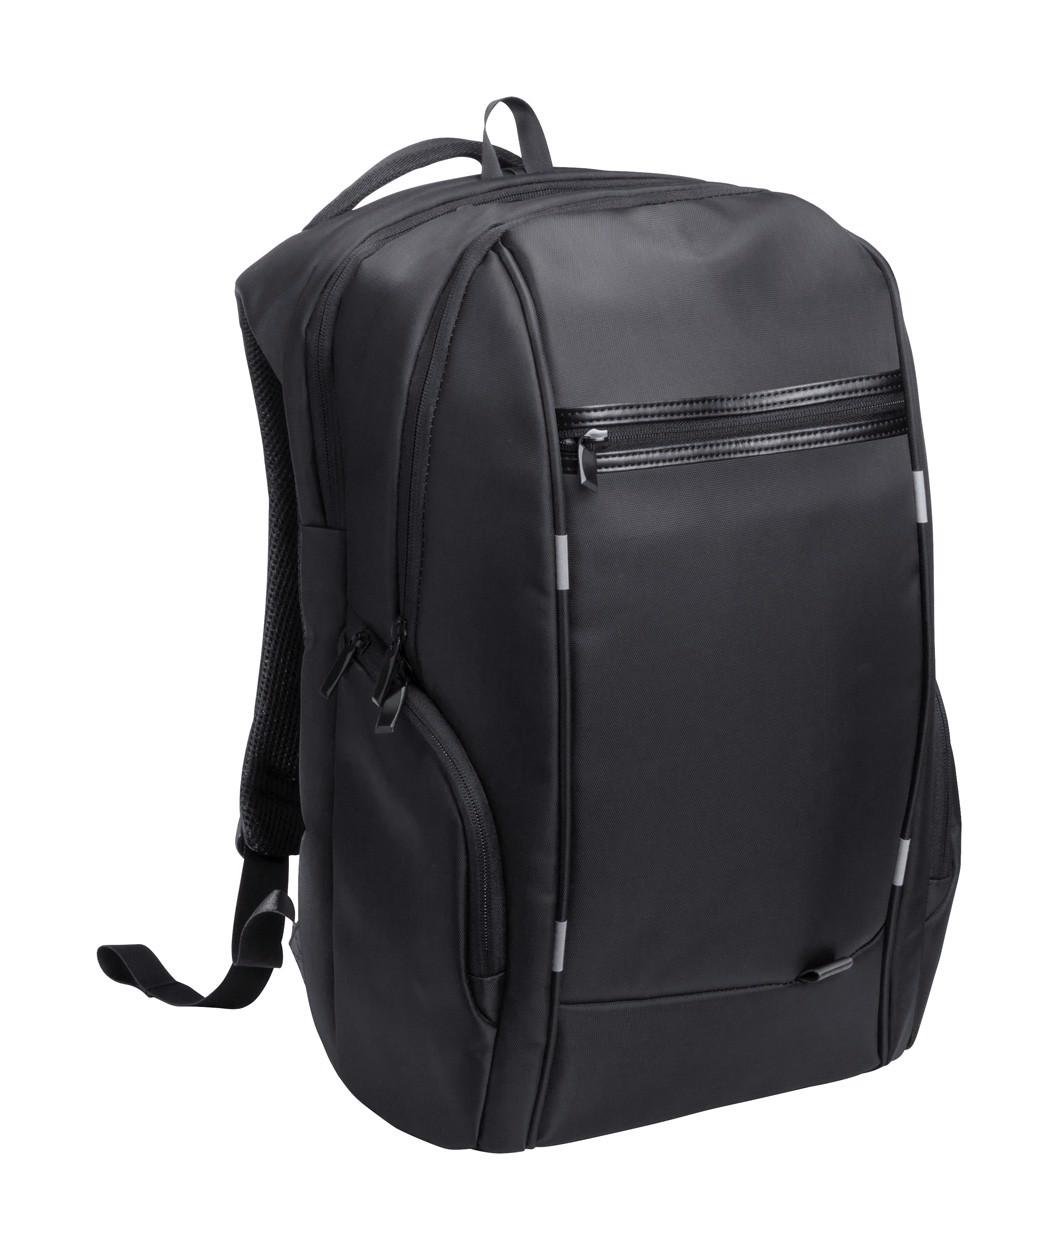 Backpack Zircan - Black